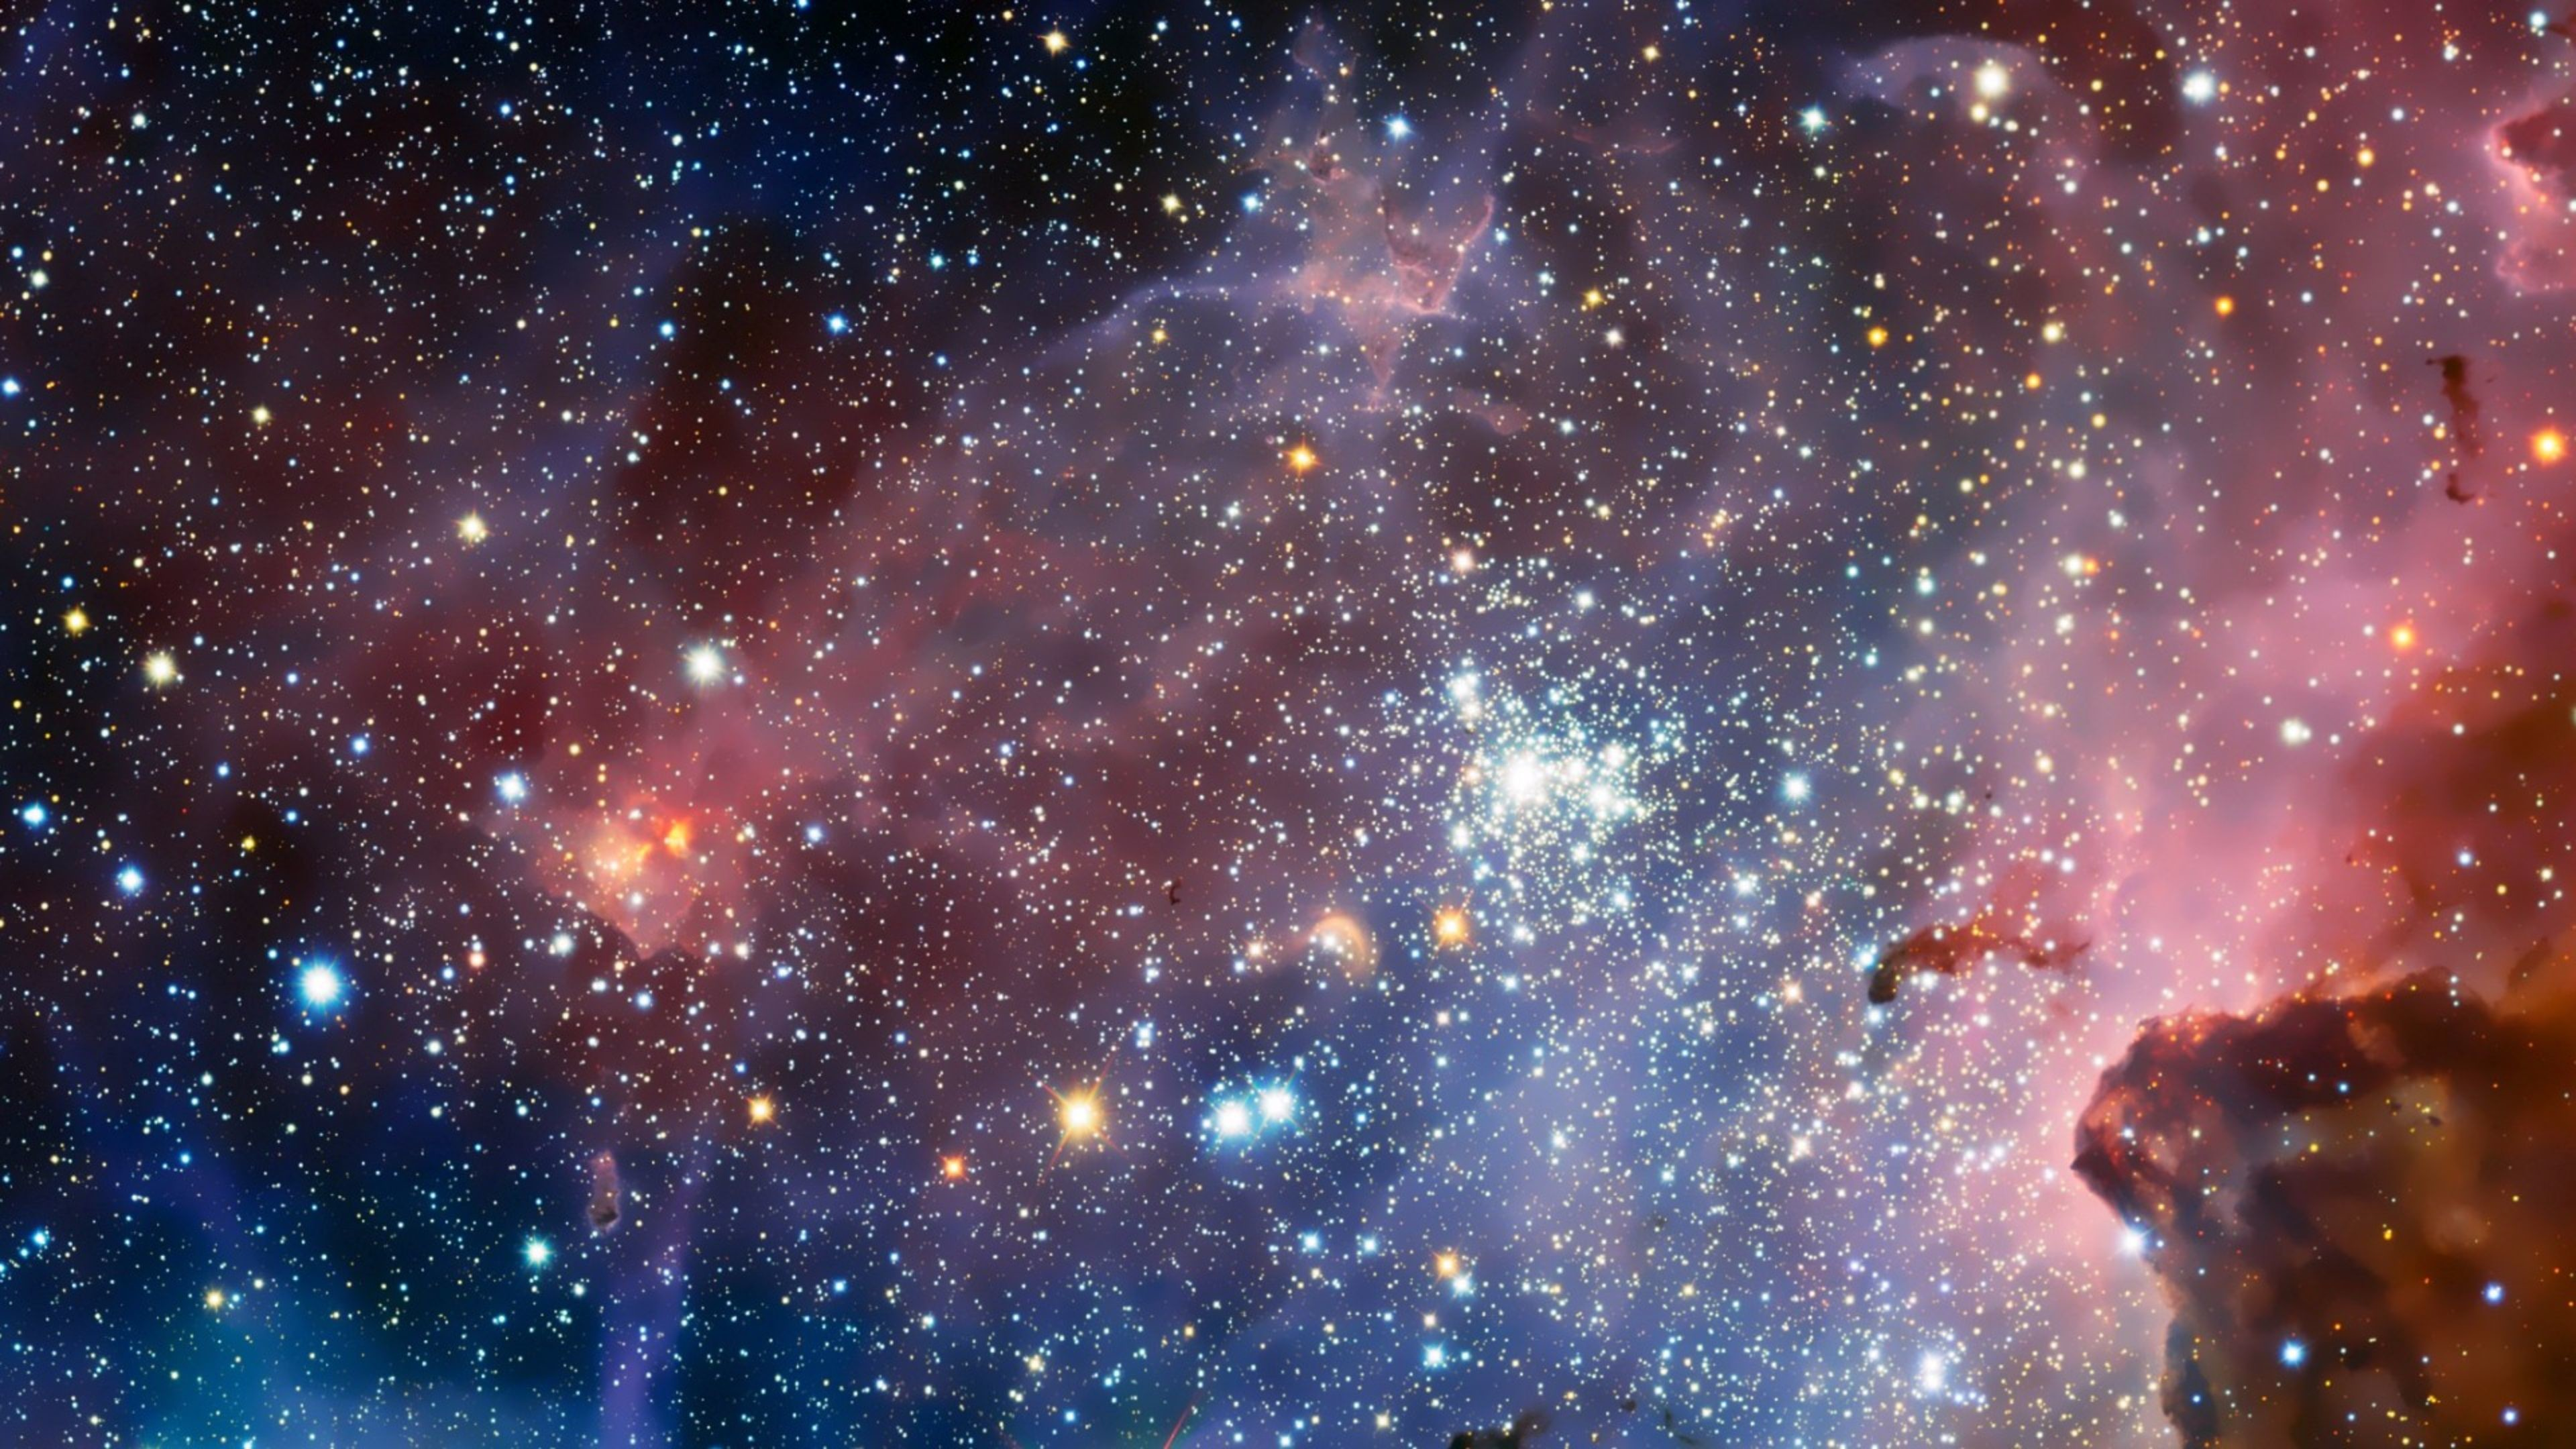 … Wallpapers 4k Space Wallpaper Deep 4K   Free Background Hd space  wallpaper …